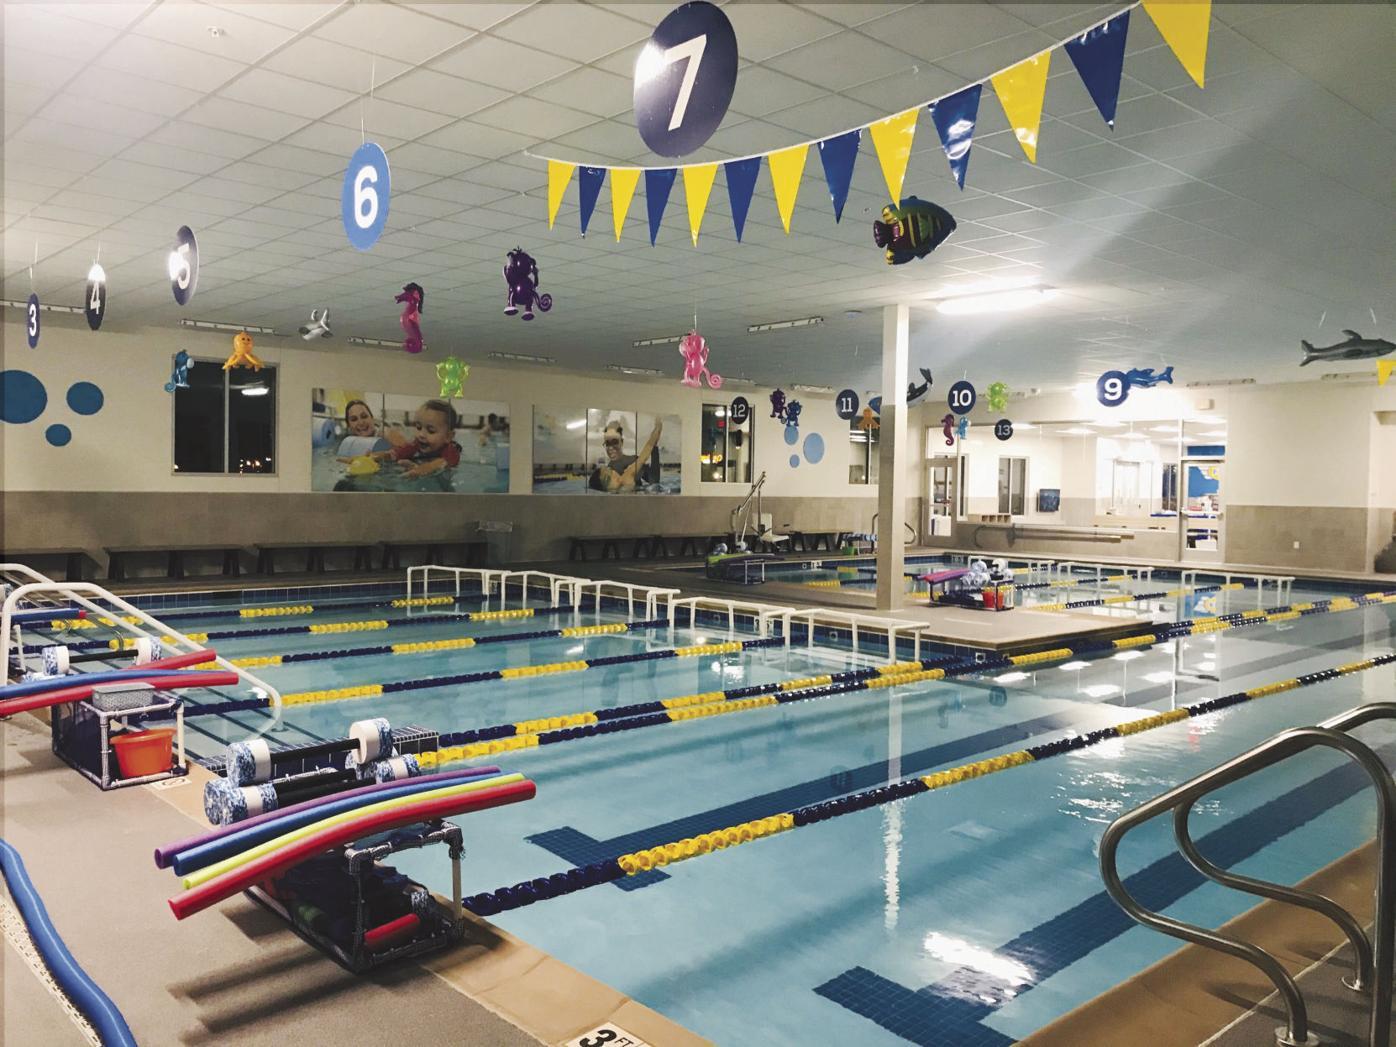 Foss Swim School focuses on teaching lifelong swim skills